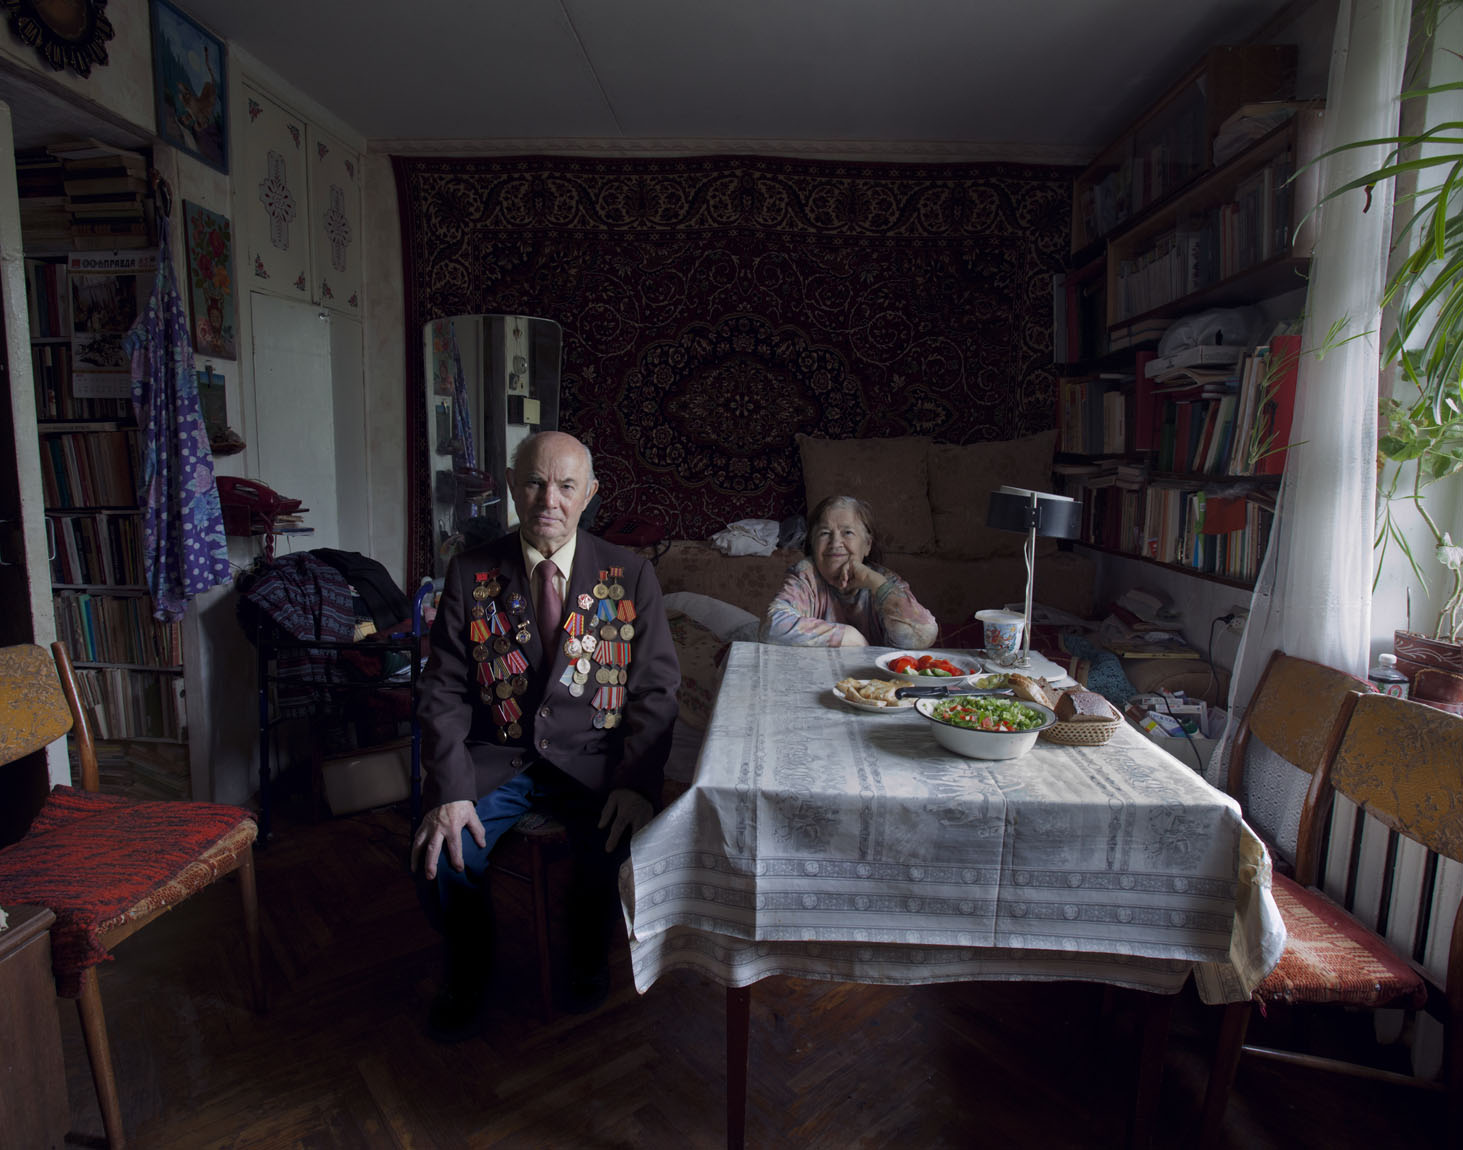 17_Pyotr Koshkin, Odintsovo, Oroszország